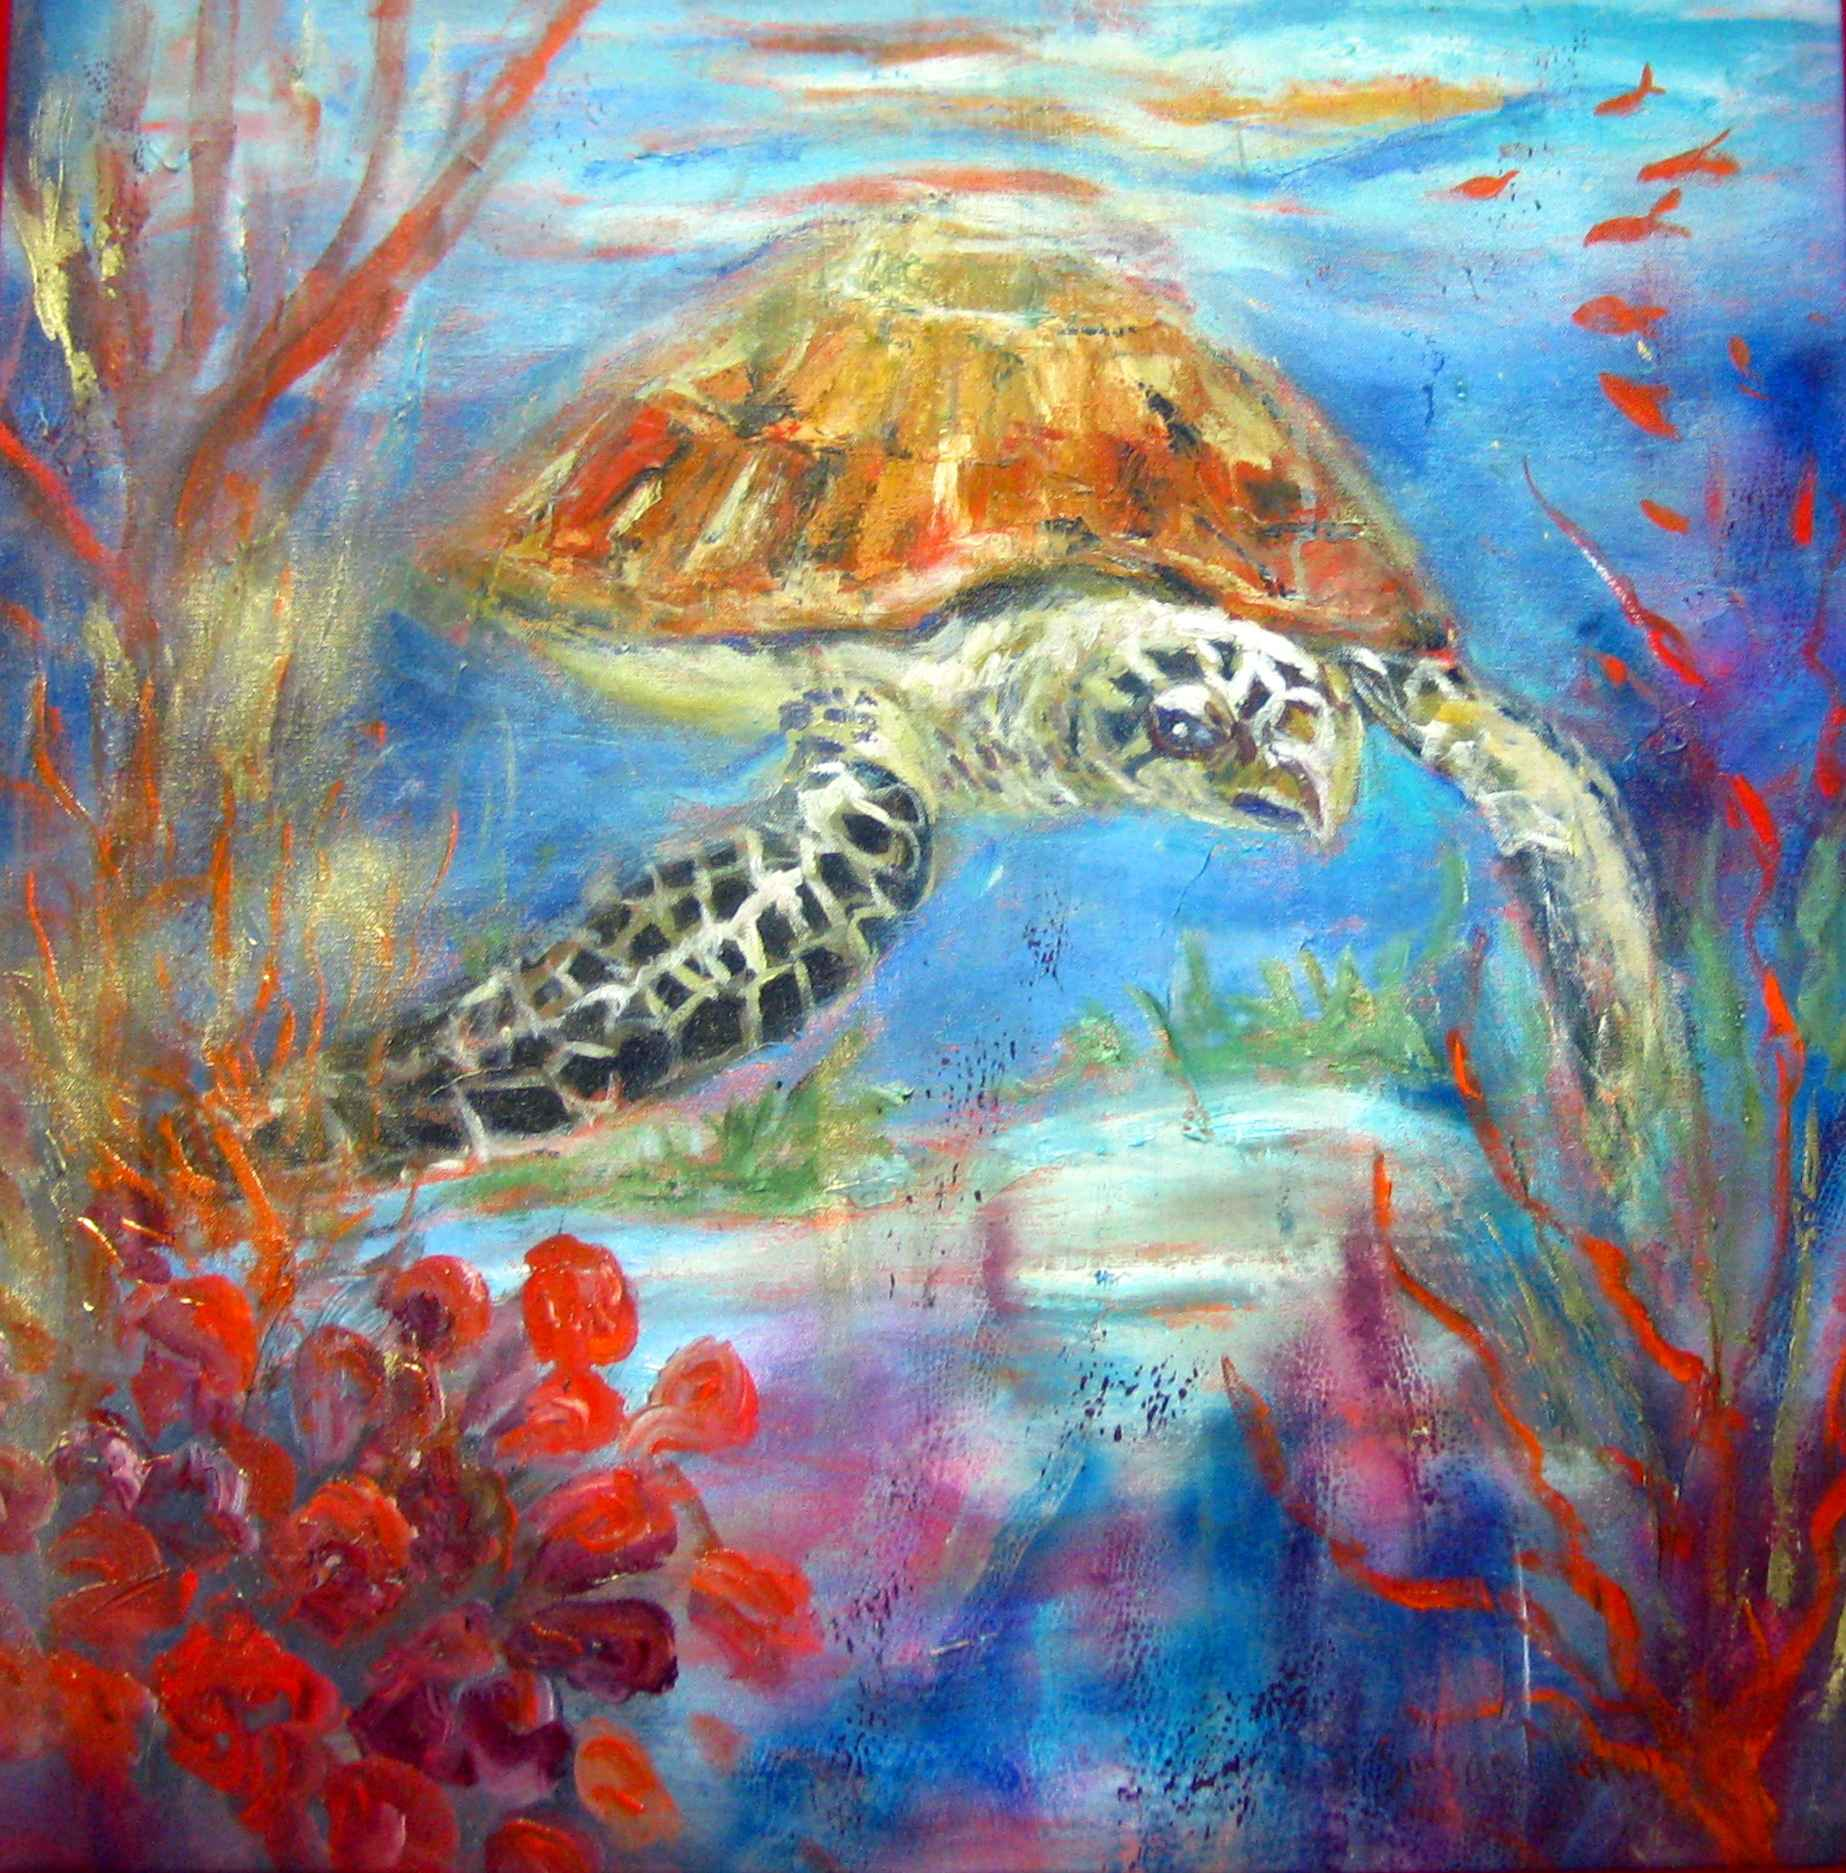 Treasured Hawksbill by Mrs. Susan Mains - Masterpiece Online